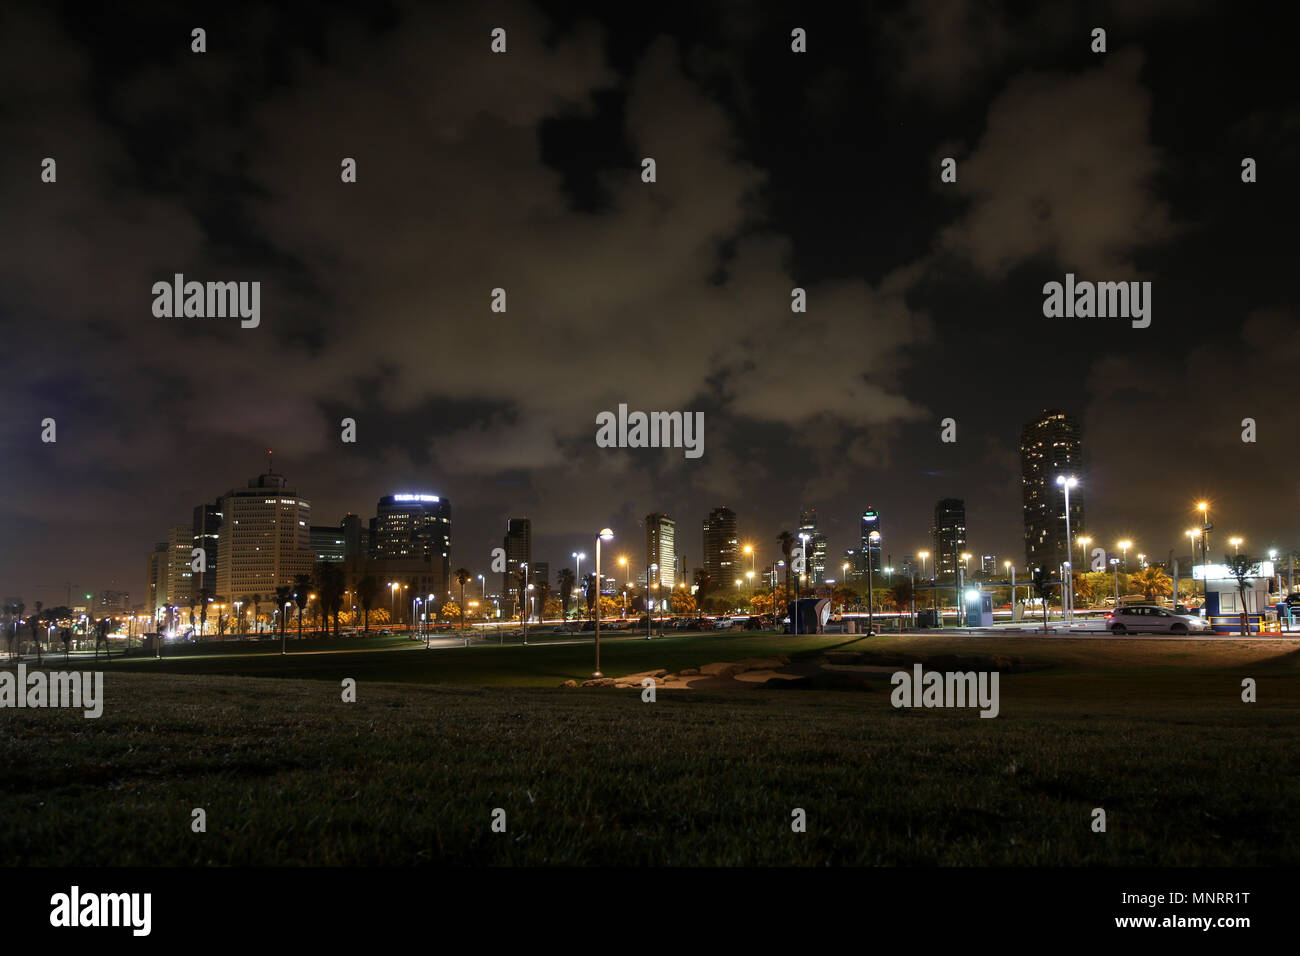 Tel Aviv, Israel - May 12, 2018: View of the coastal metropolis Tel Aviv at night, Israel. - Stock Image